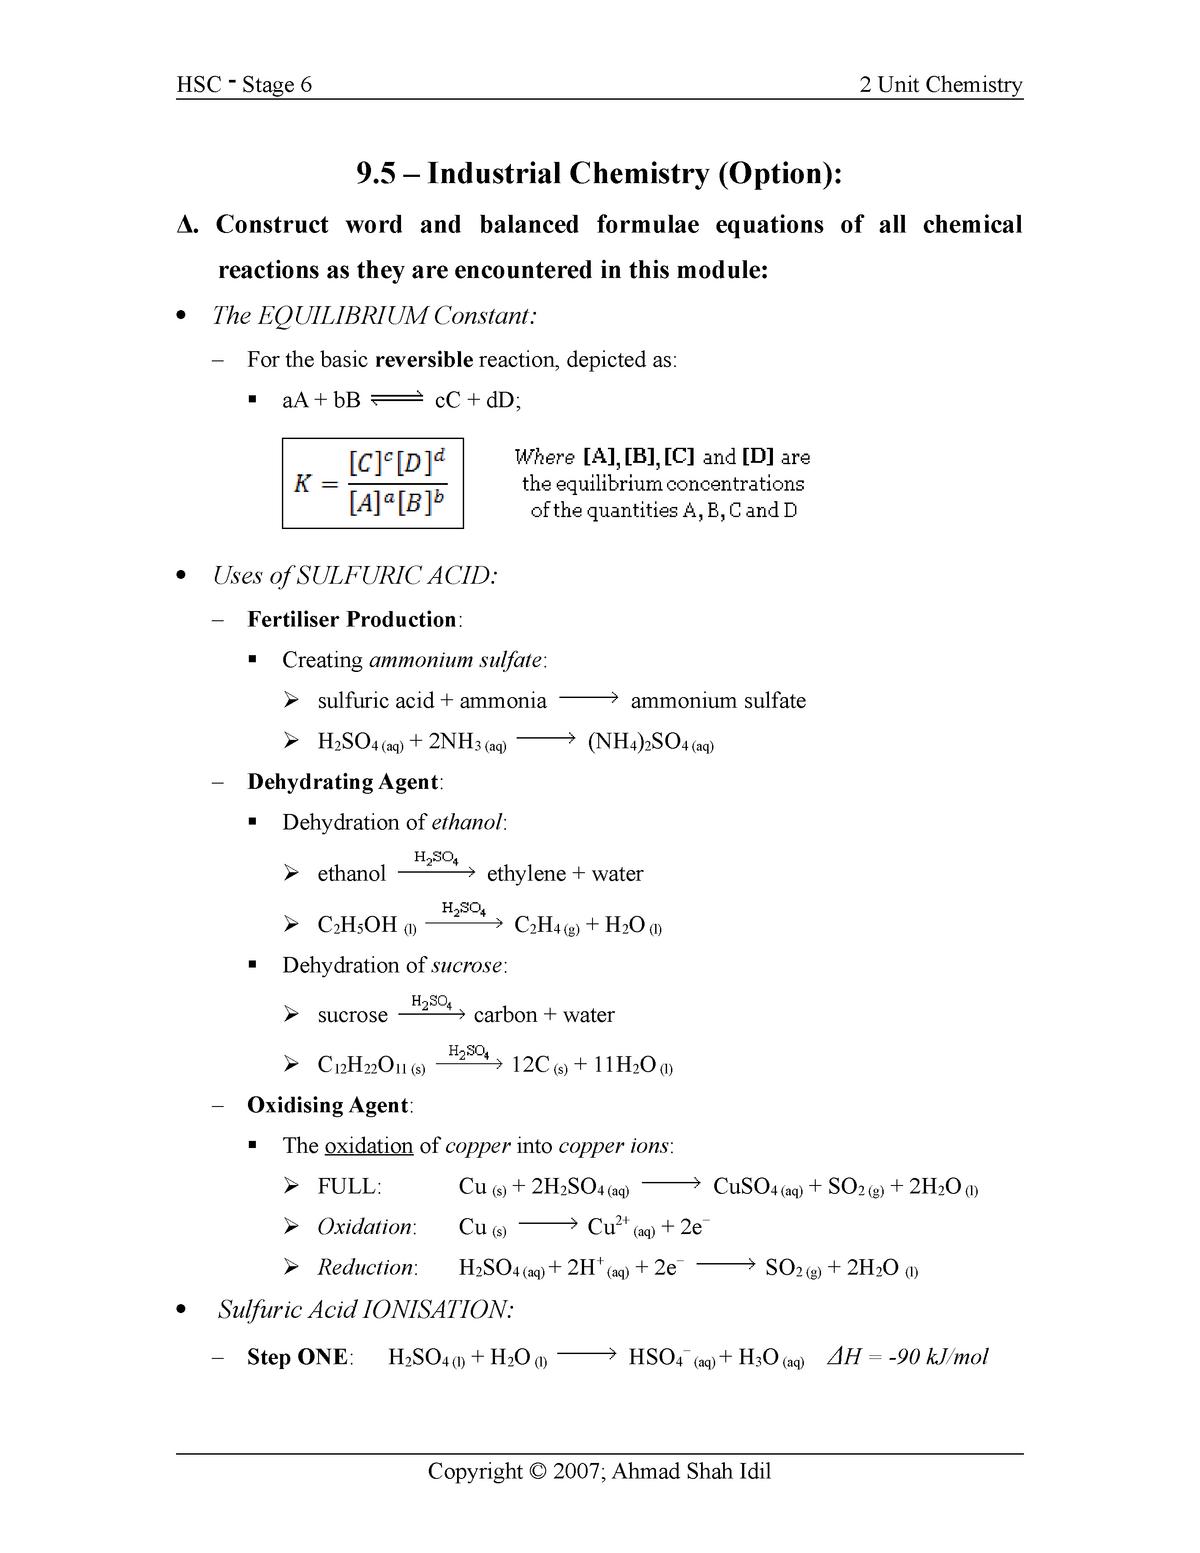 industrial chem - Chemistry 1 065111 - StuDocu